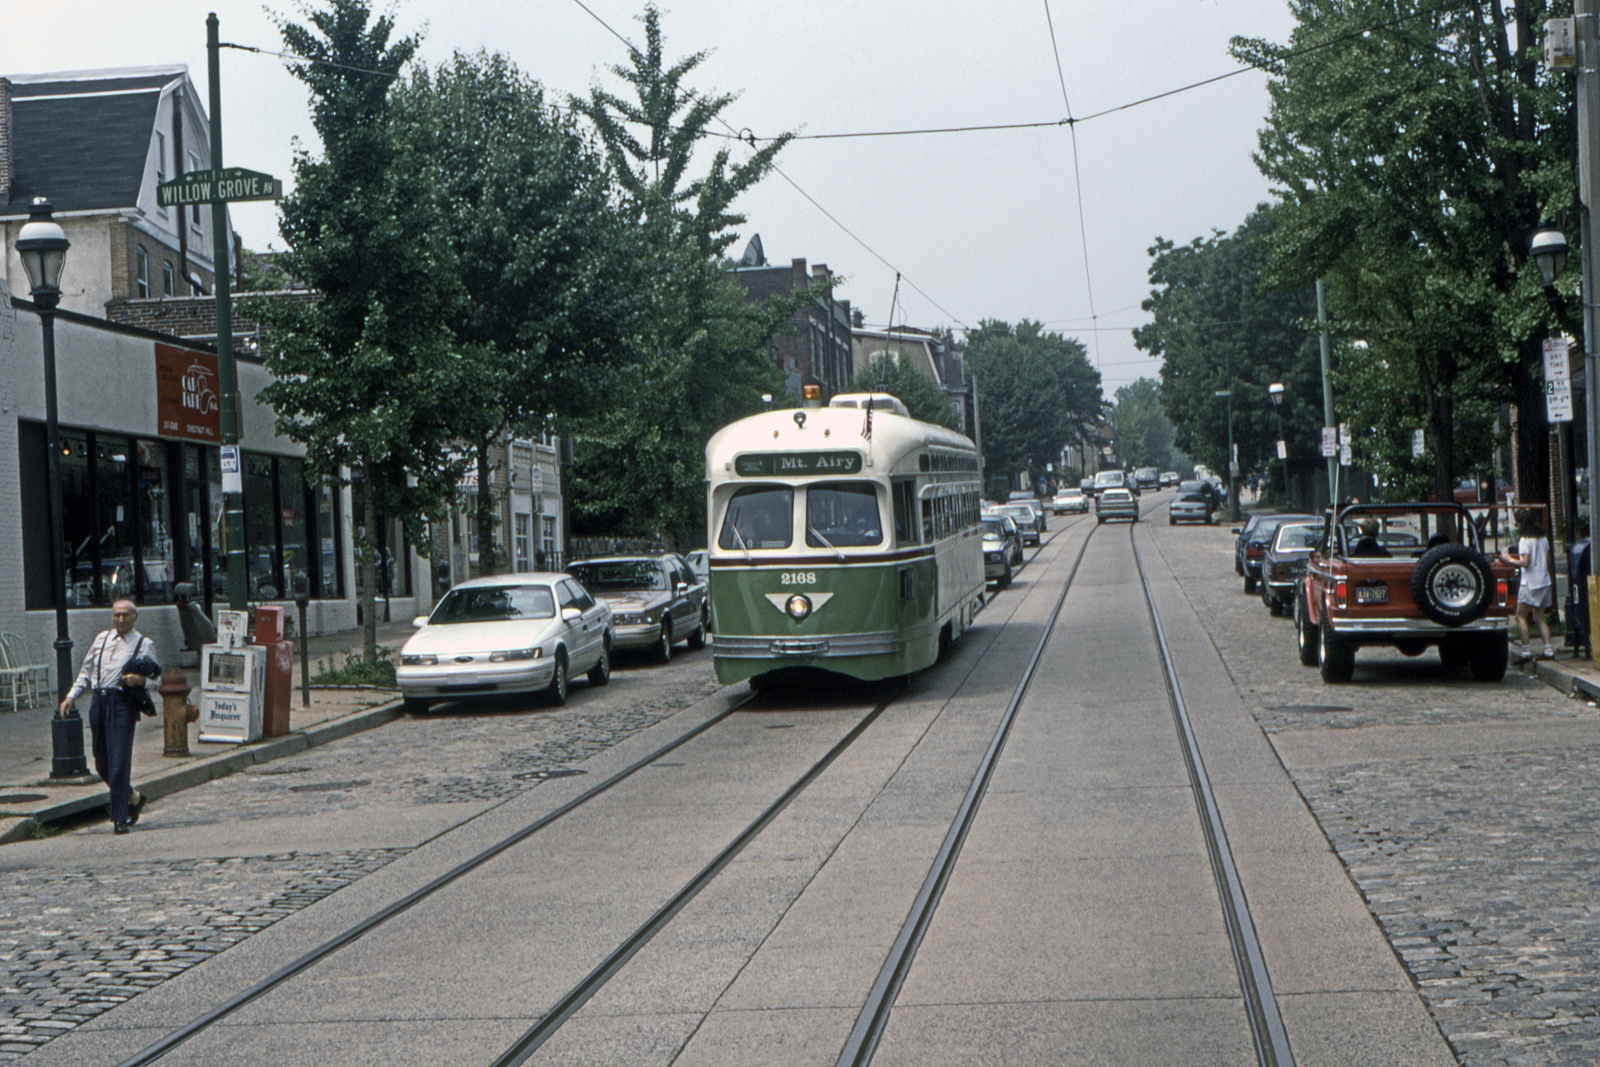 (883k, 1600x1067)<br><b>Country:</b> United States<br><b>City:</b> Philadelphia, PA<br><b>System:</b> SEPTA (or Predecessor)<br><b>Line:</b> Rt. 23-Germantown<br><b>Location:</b> Germantown/Willow Grove<br><b>Car:</b> PTC/SEPTA Postwar All-electric PCC (St.Louis, 1948) 2168 <br><b>Collection of:</b> David Pirmann<br><b>Date:</b> 1993<br><b>Viewed (this week/total):</b> 0 / 47